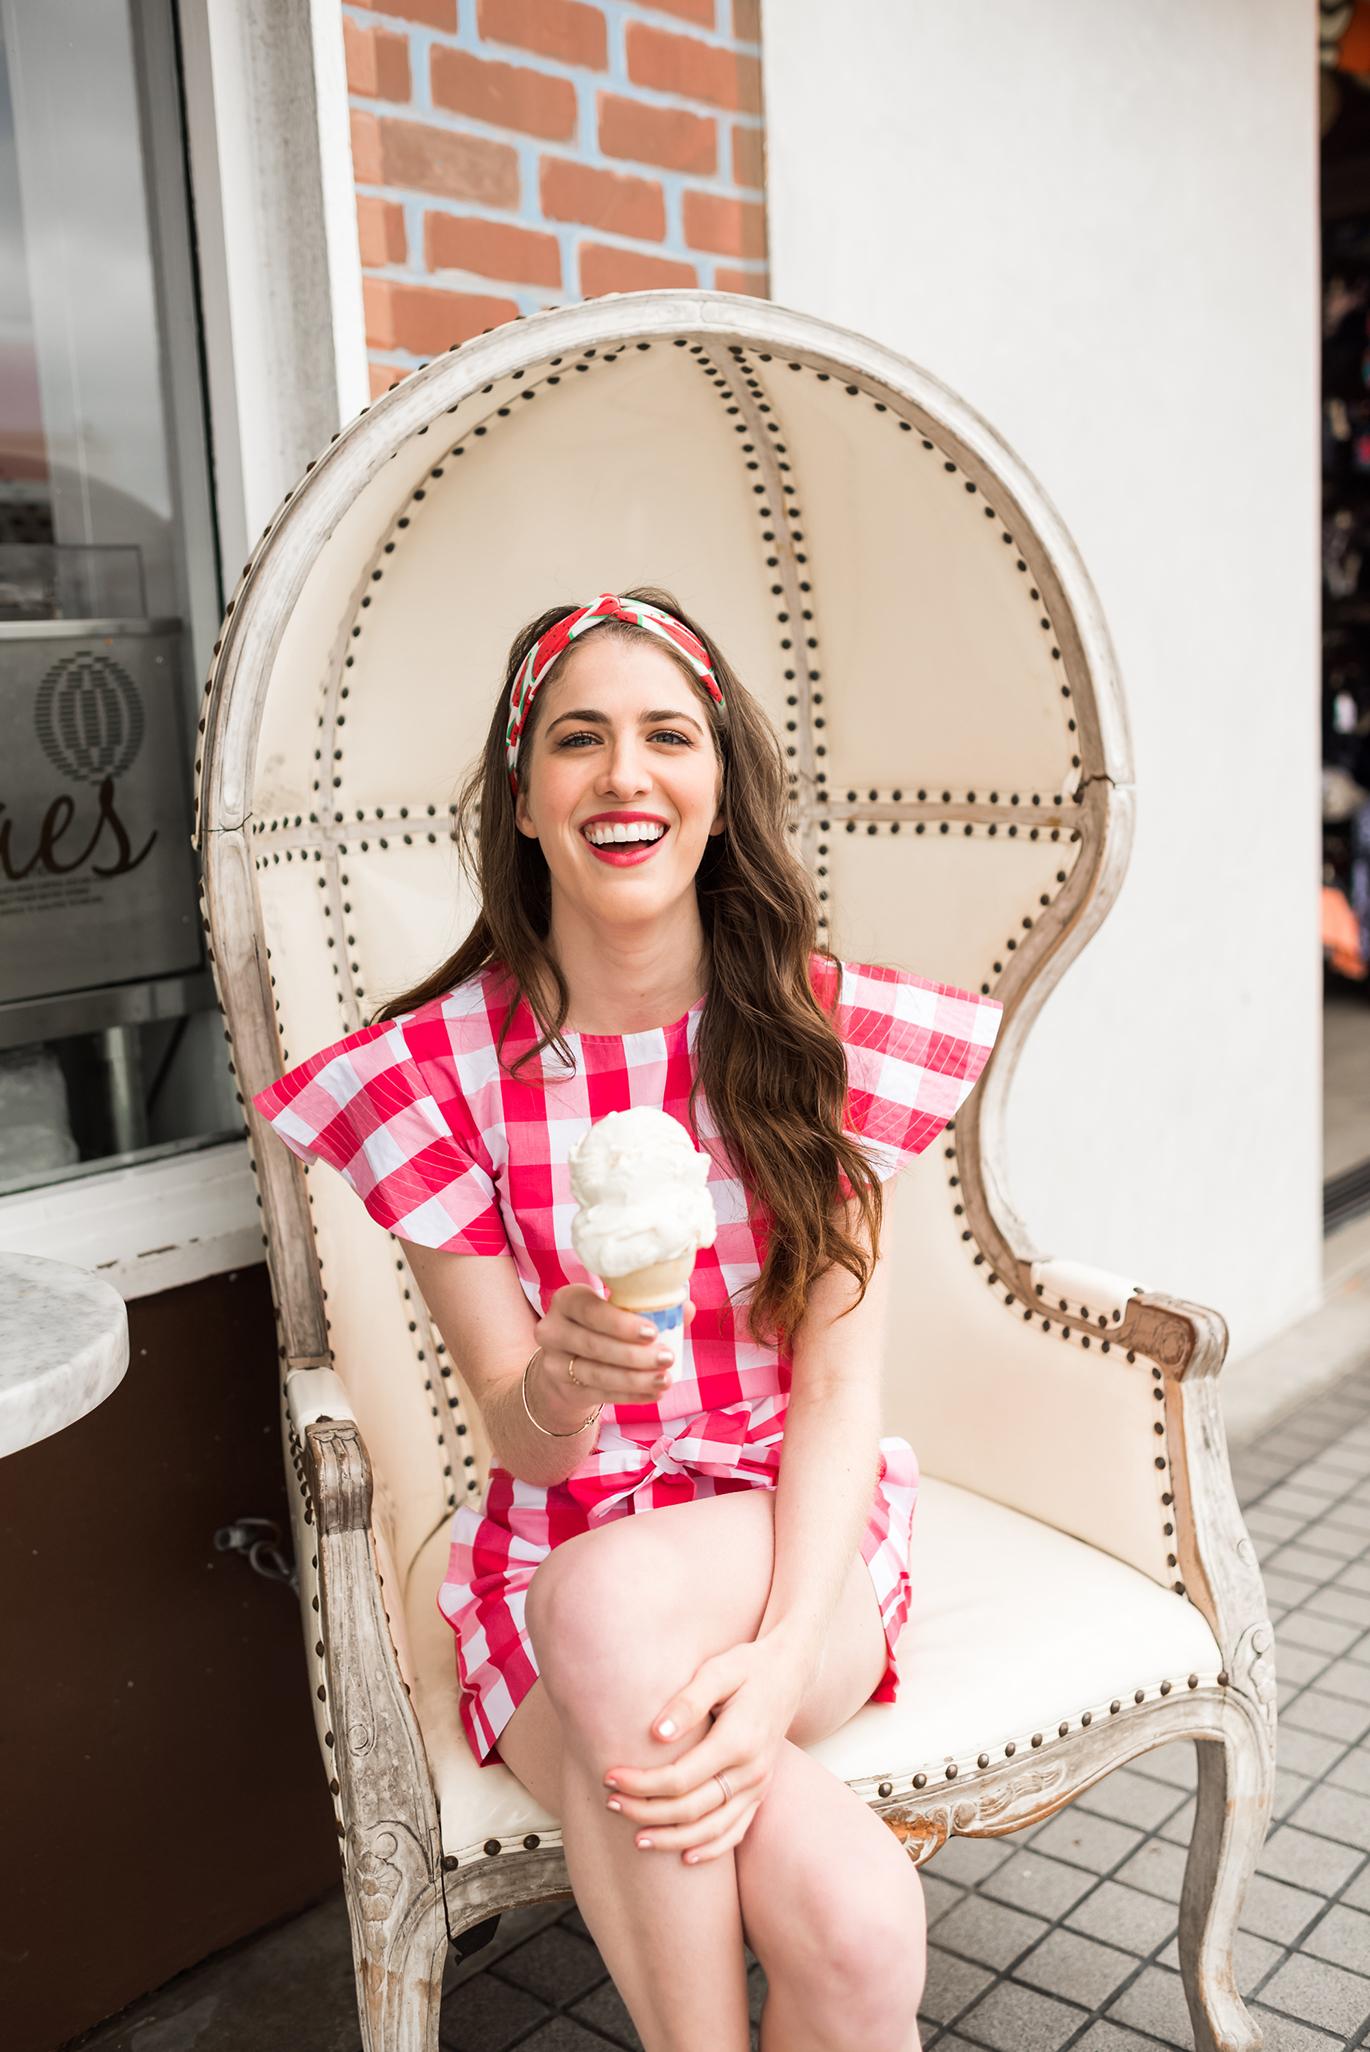 Manhattan Beach ice cream